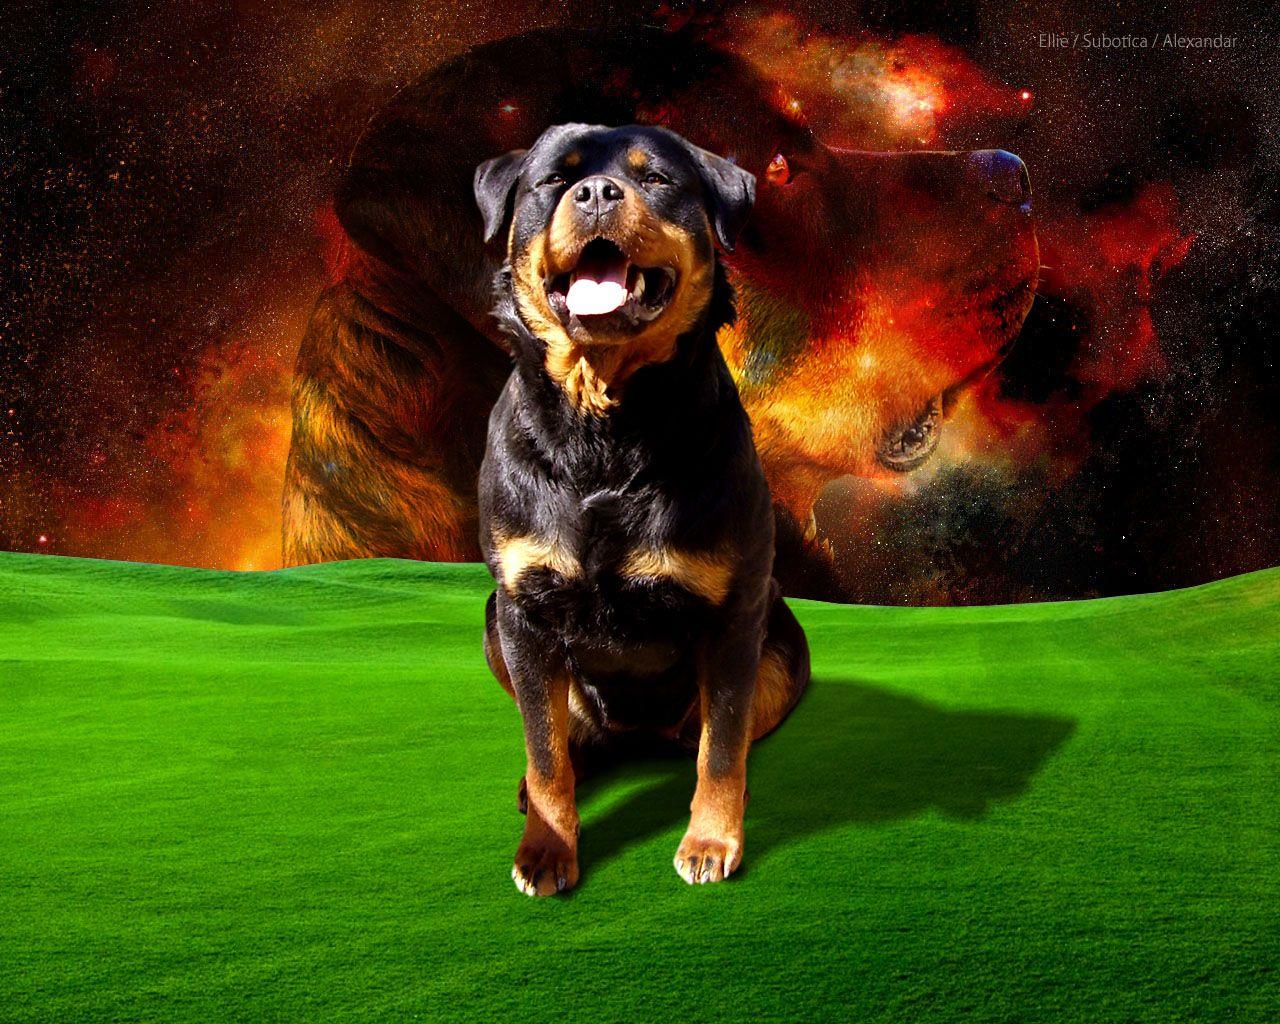 Rottweiler Wallpapers 1800 1200 Rottweiler Wallpaper 34 Wallpapers Adorable Wallpapers Dog Wallpaper Rottweiler Rottweiler Love